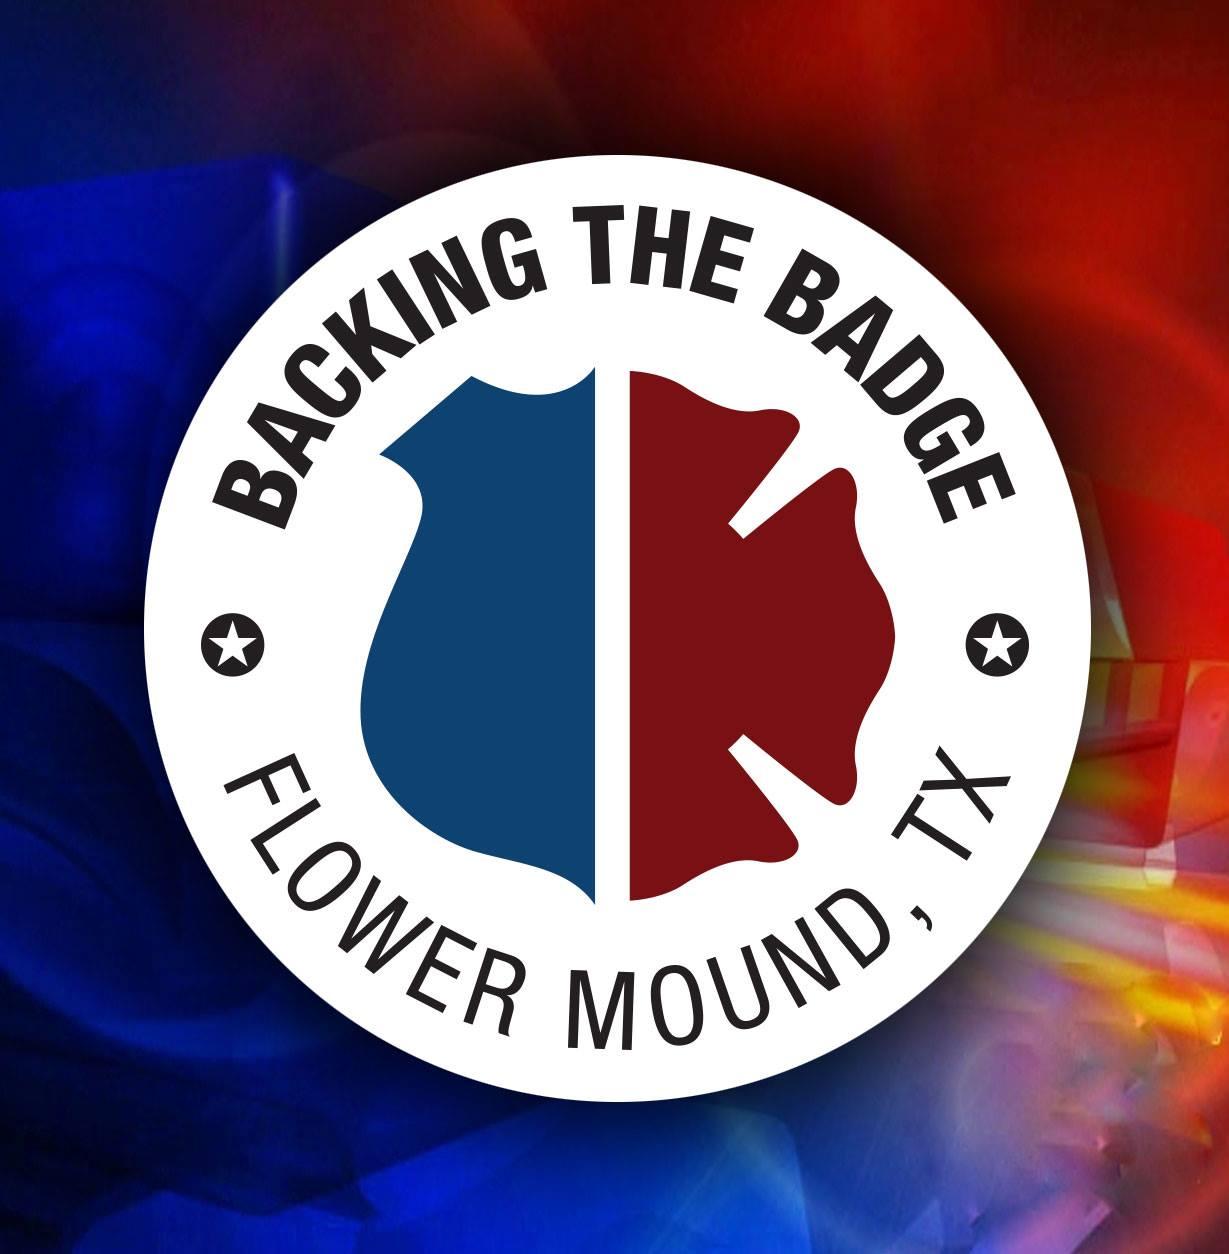 Flower Mound TX ficial Website